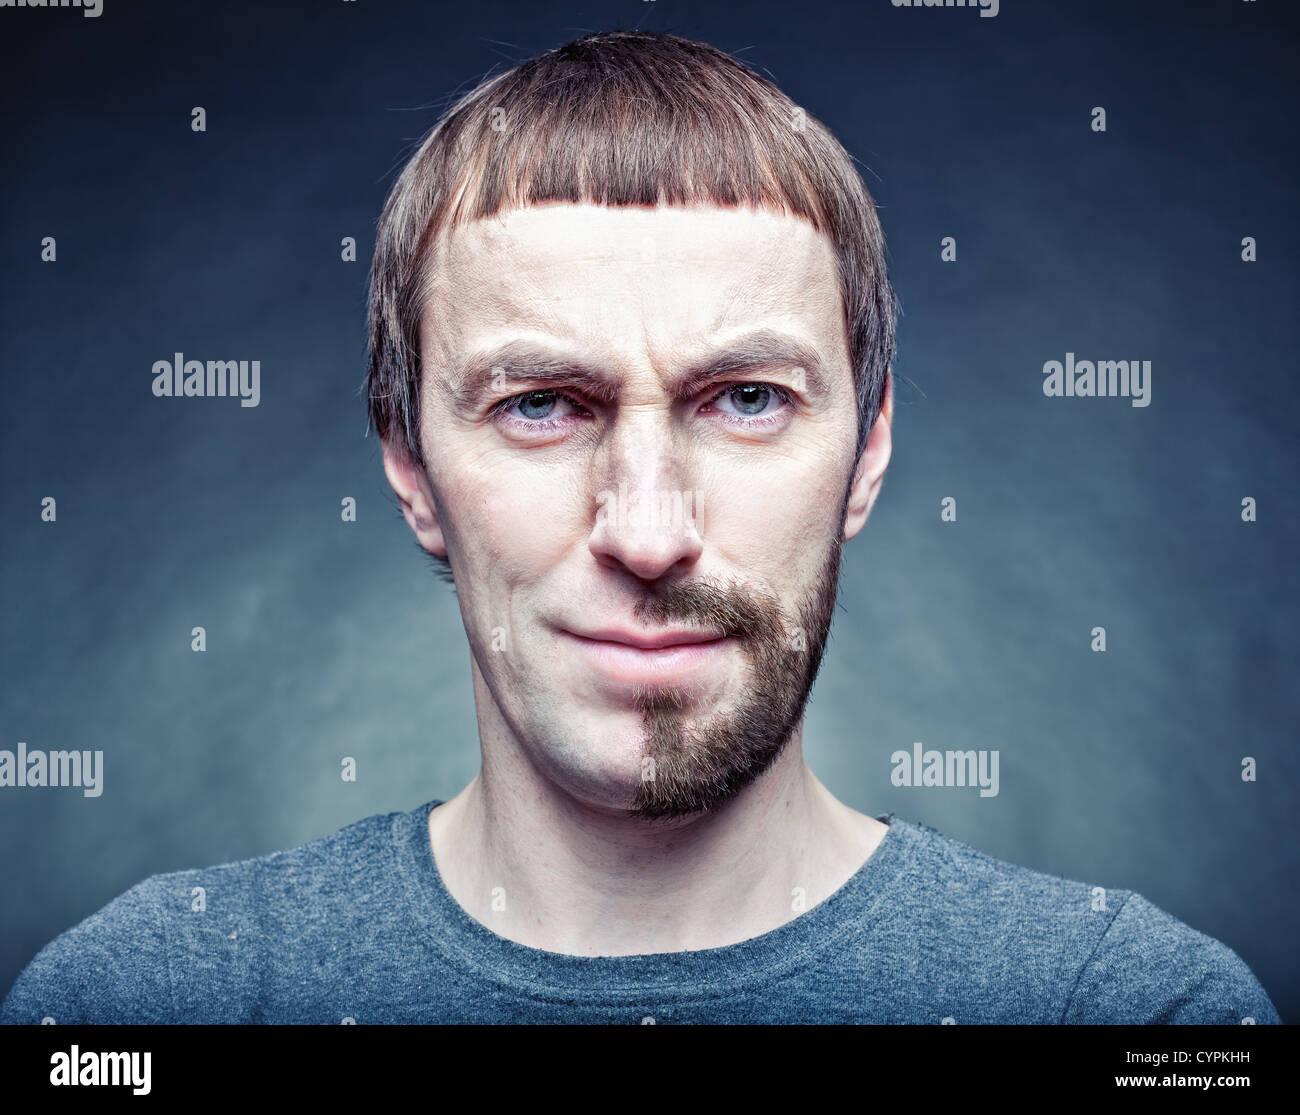 Fase de barbear o rosto metade. foto conceito Imagens de Stock